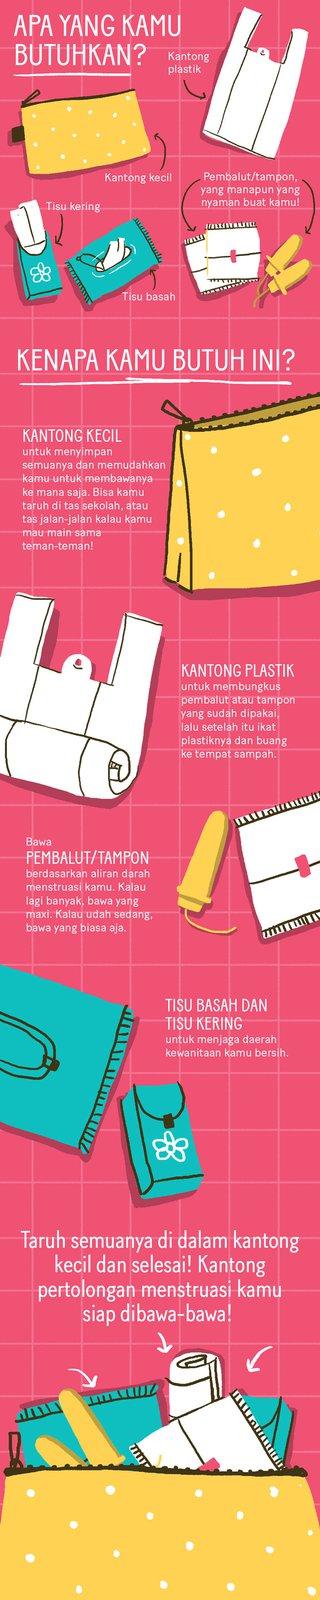 DIY Kantong Pertolongan Menstruasi